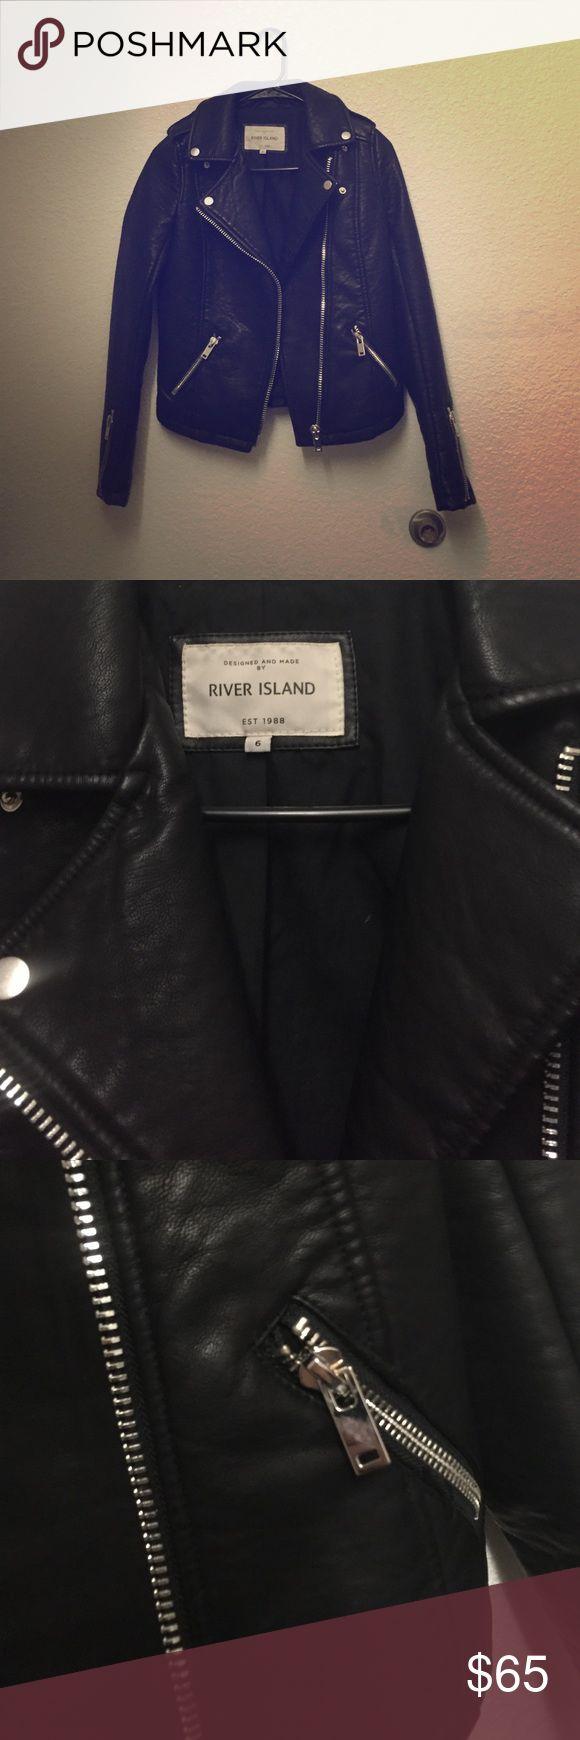 River island black zipper biker jacket Great style bought in London. Euro size 6 = US size 0 River Island Jackets & Coats